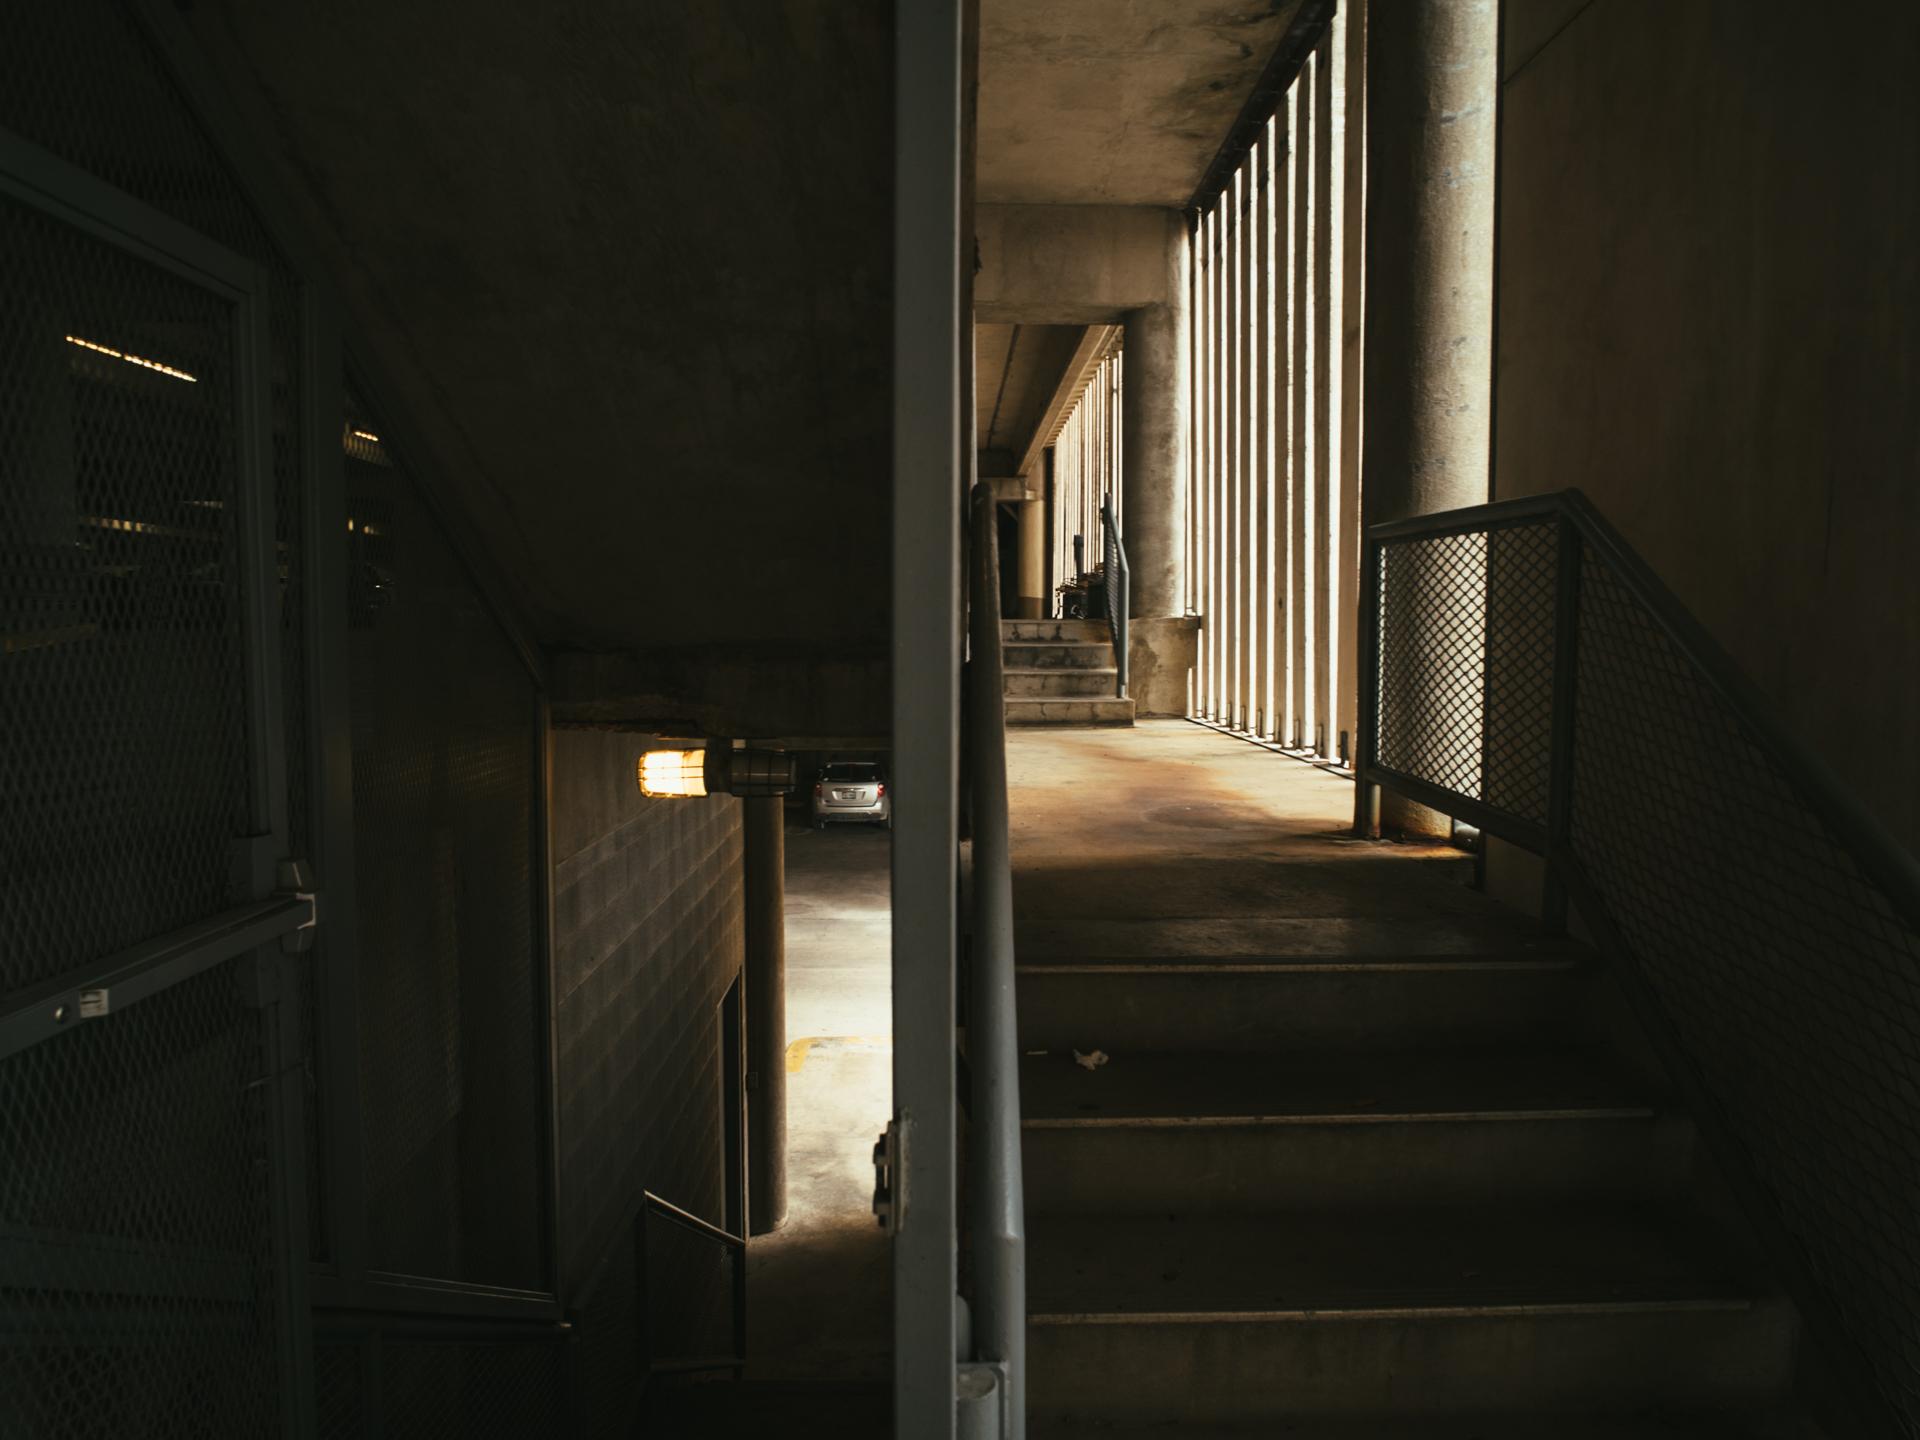 spaces+light-8.jpg